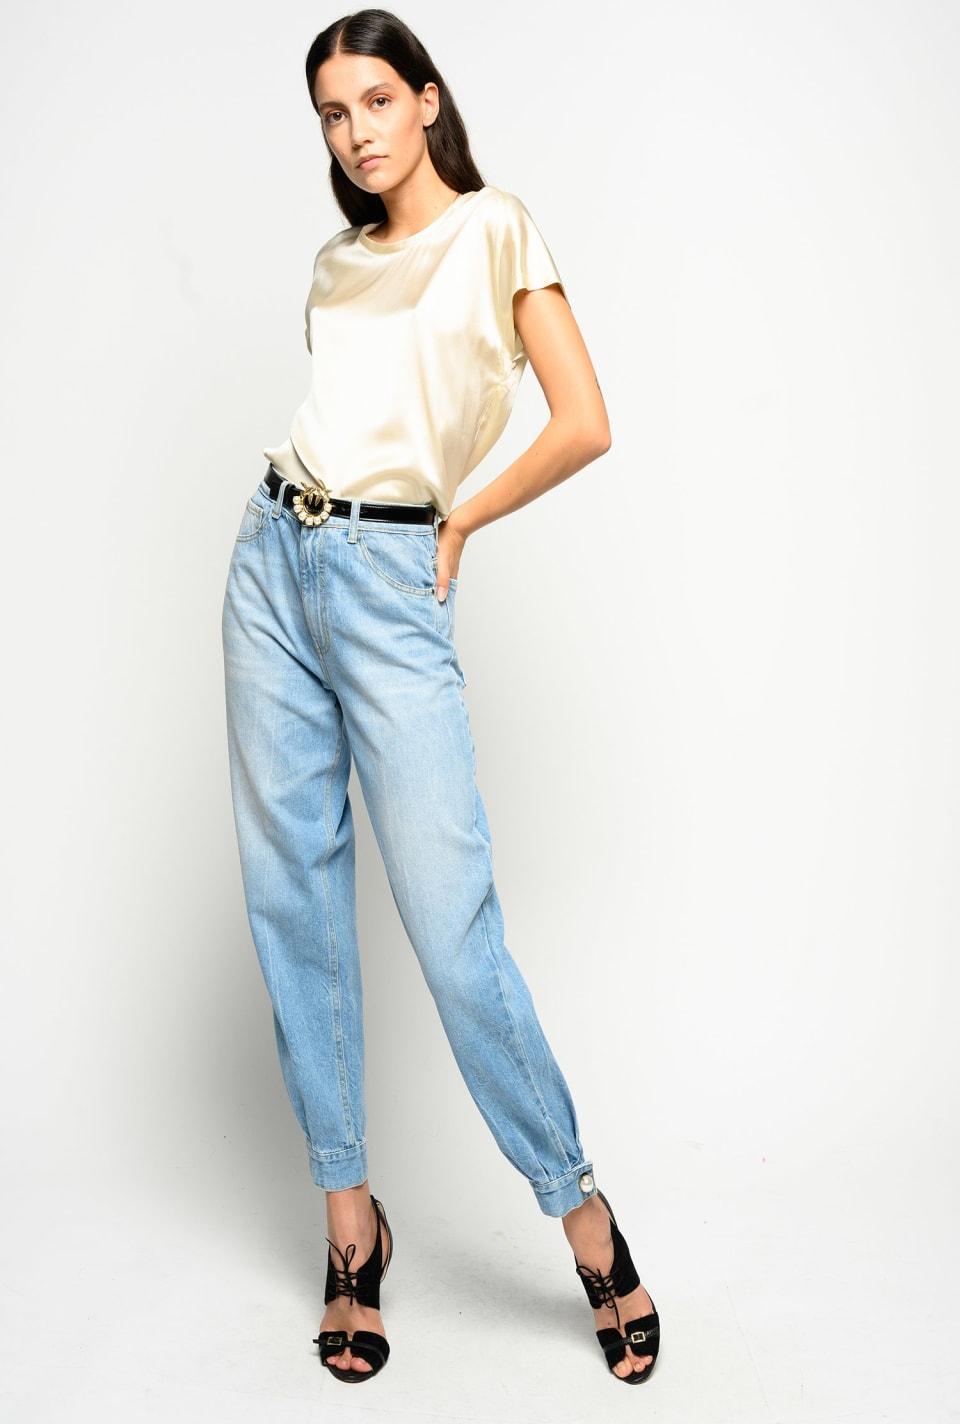 末端珍珠装饰mom-fit裤子 - Pinko